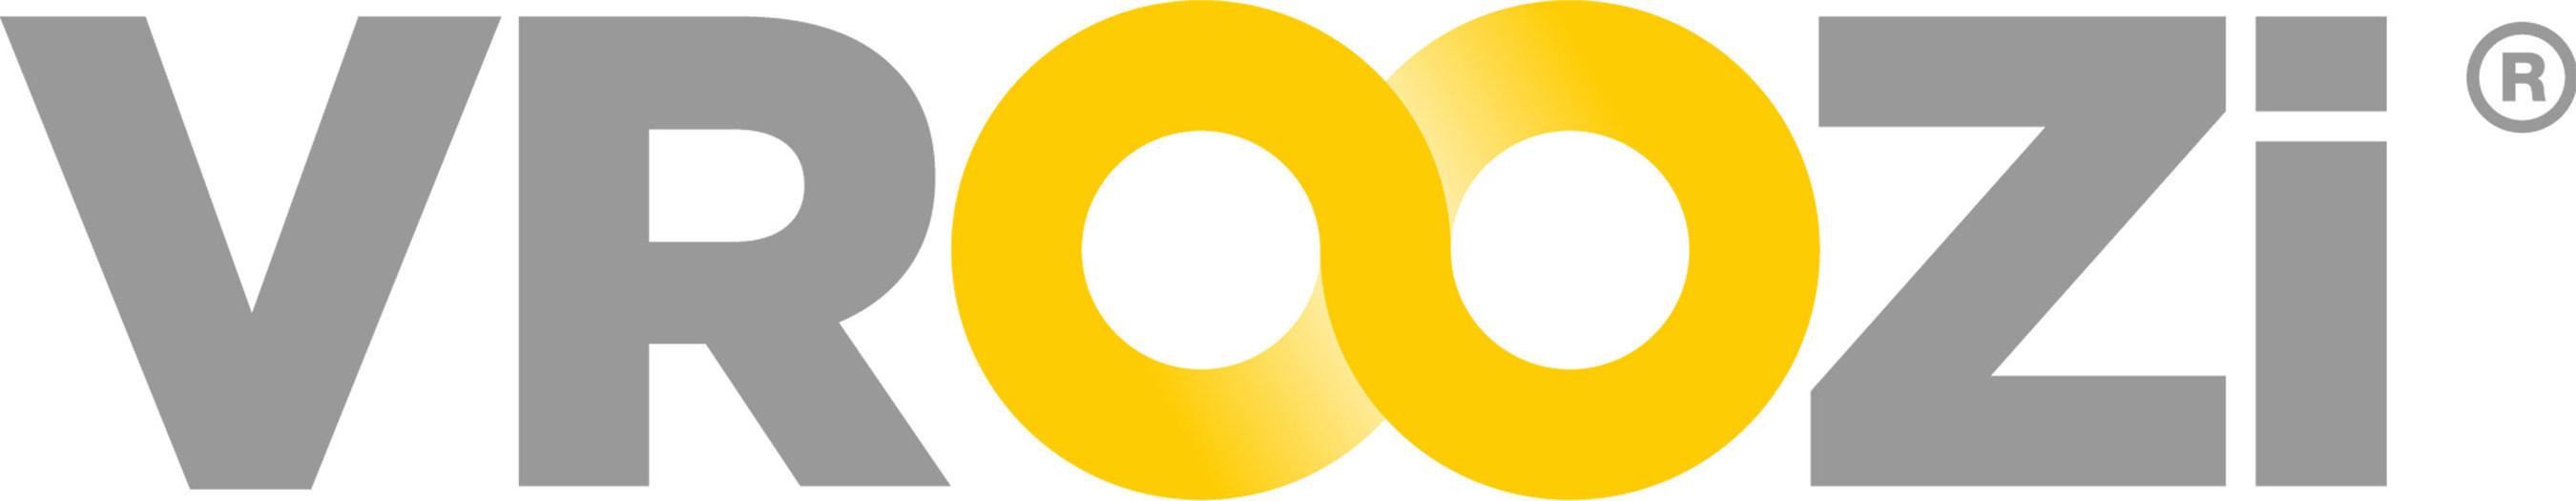 Vroozi Logo